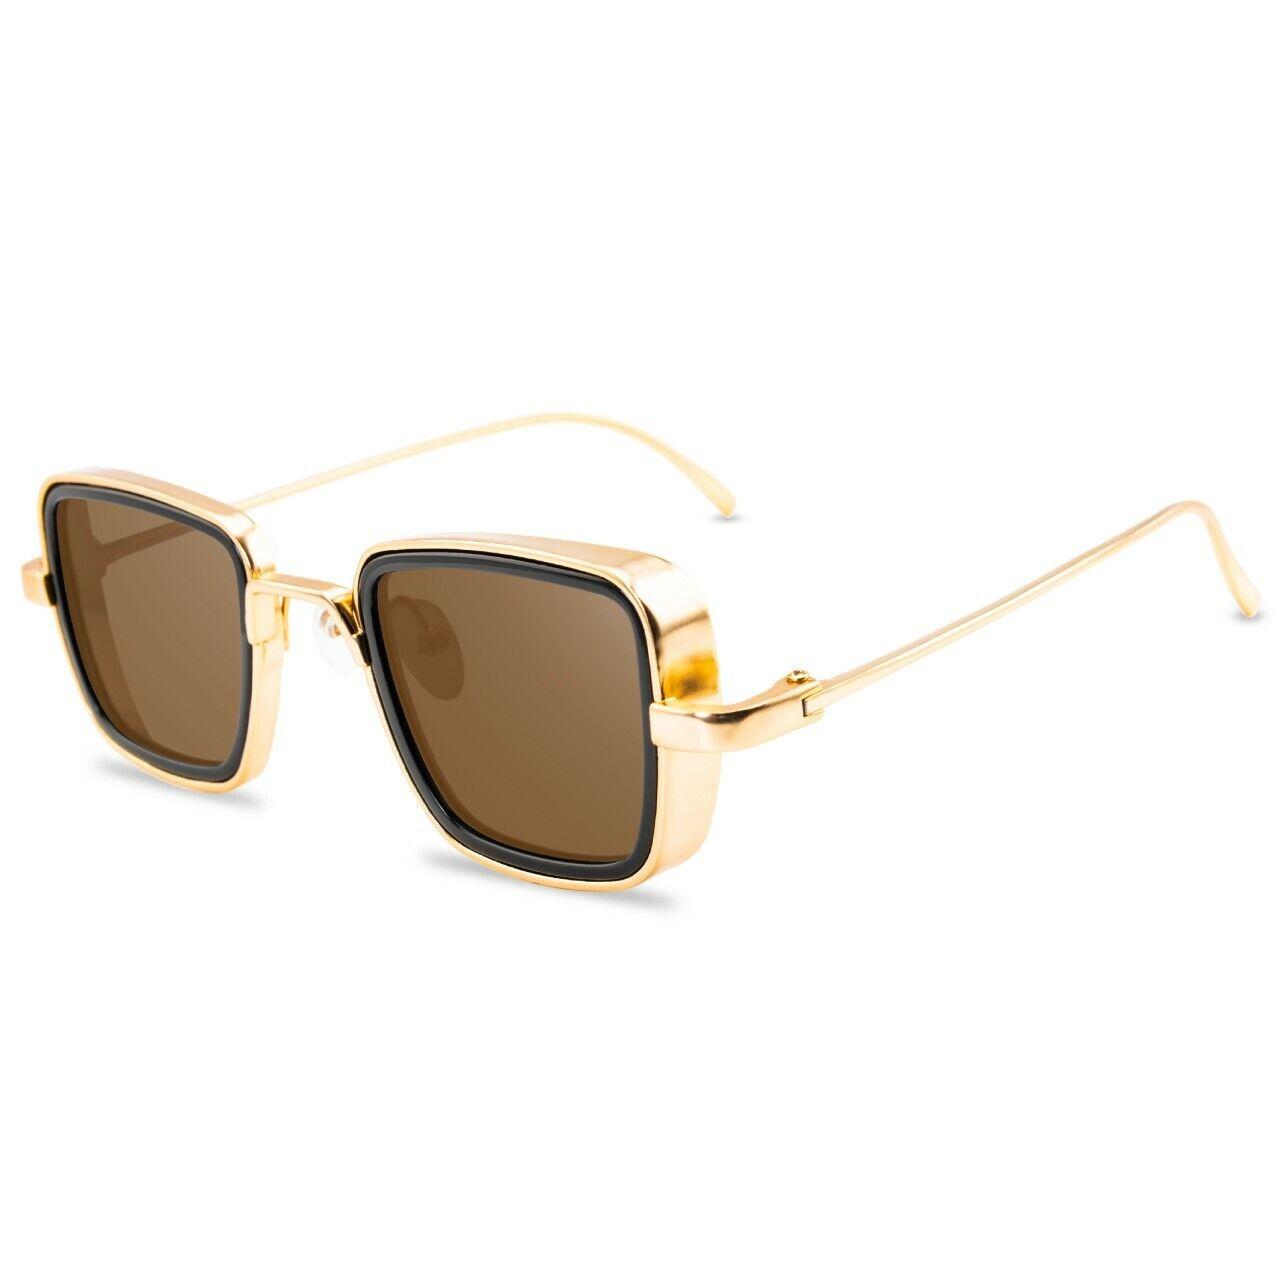 Starlite Brand Highest quality Brown lenses,Trillium frames ,Sunglasses, case